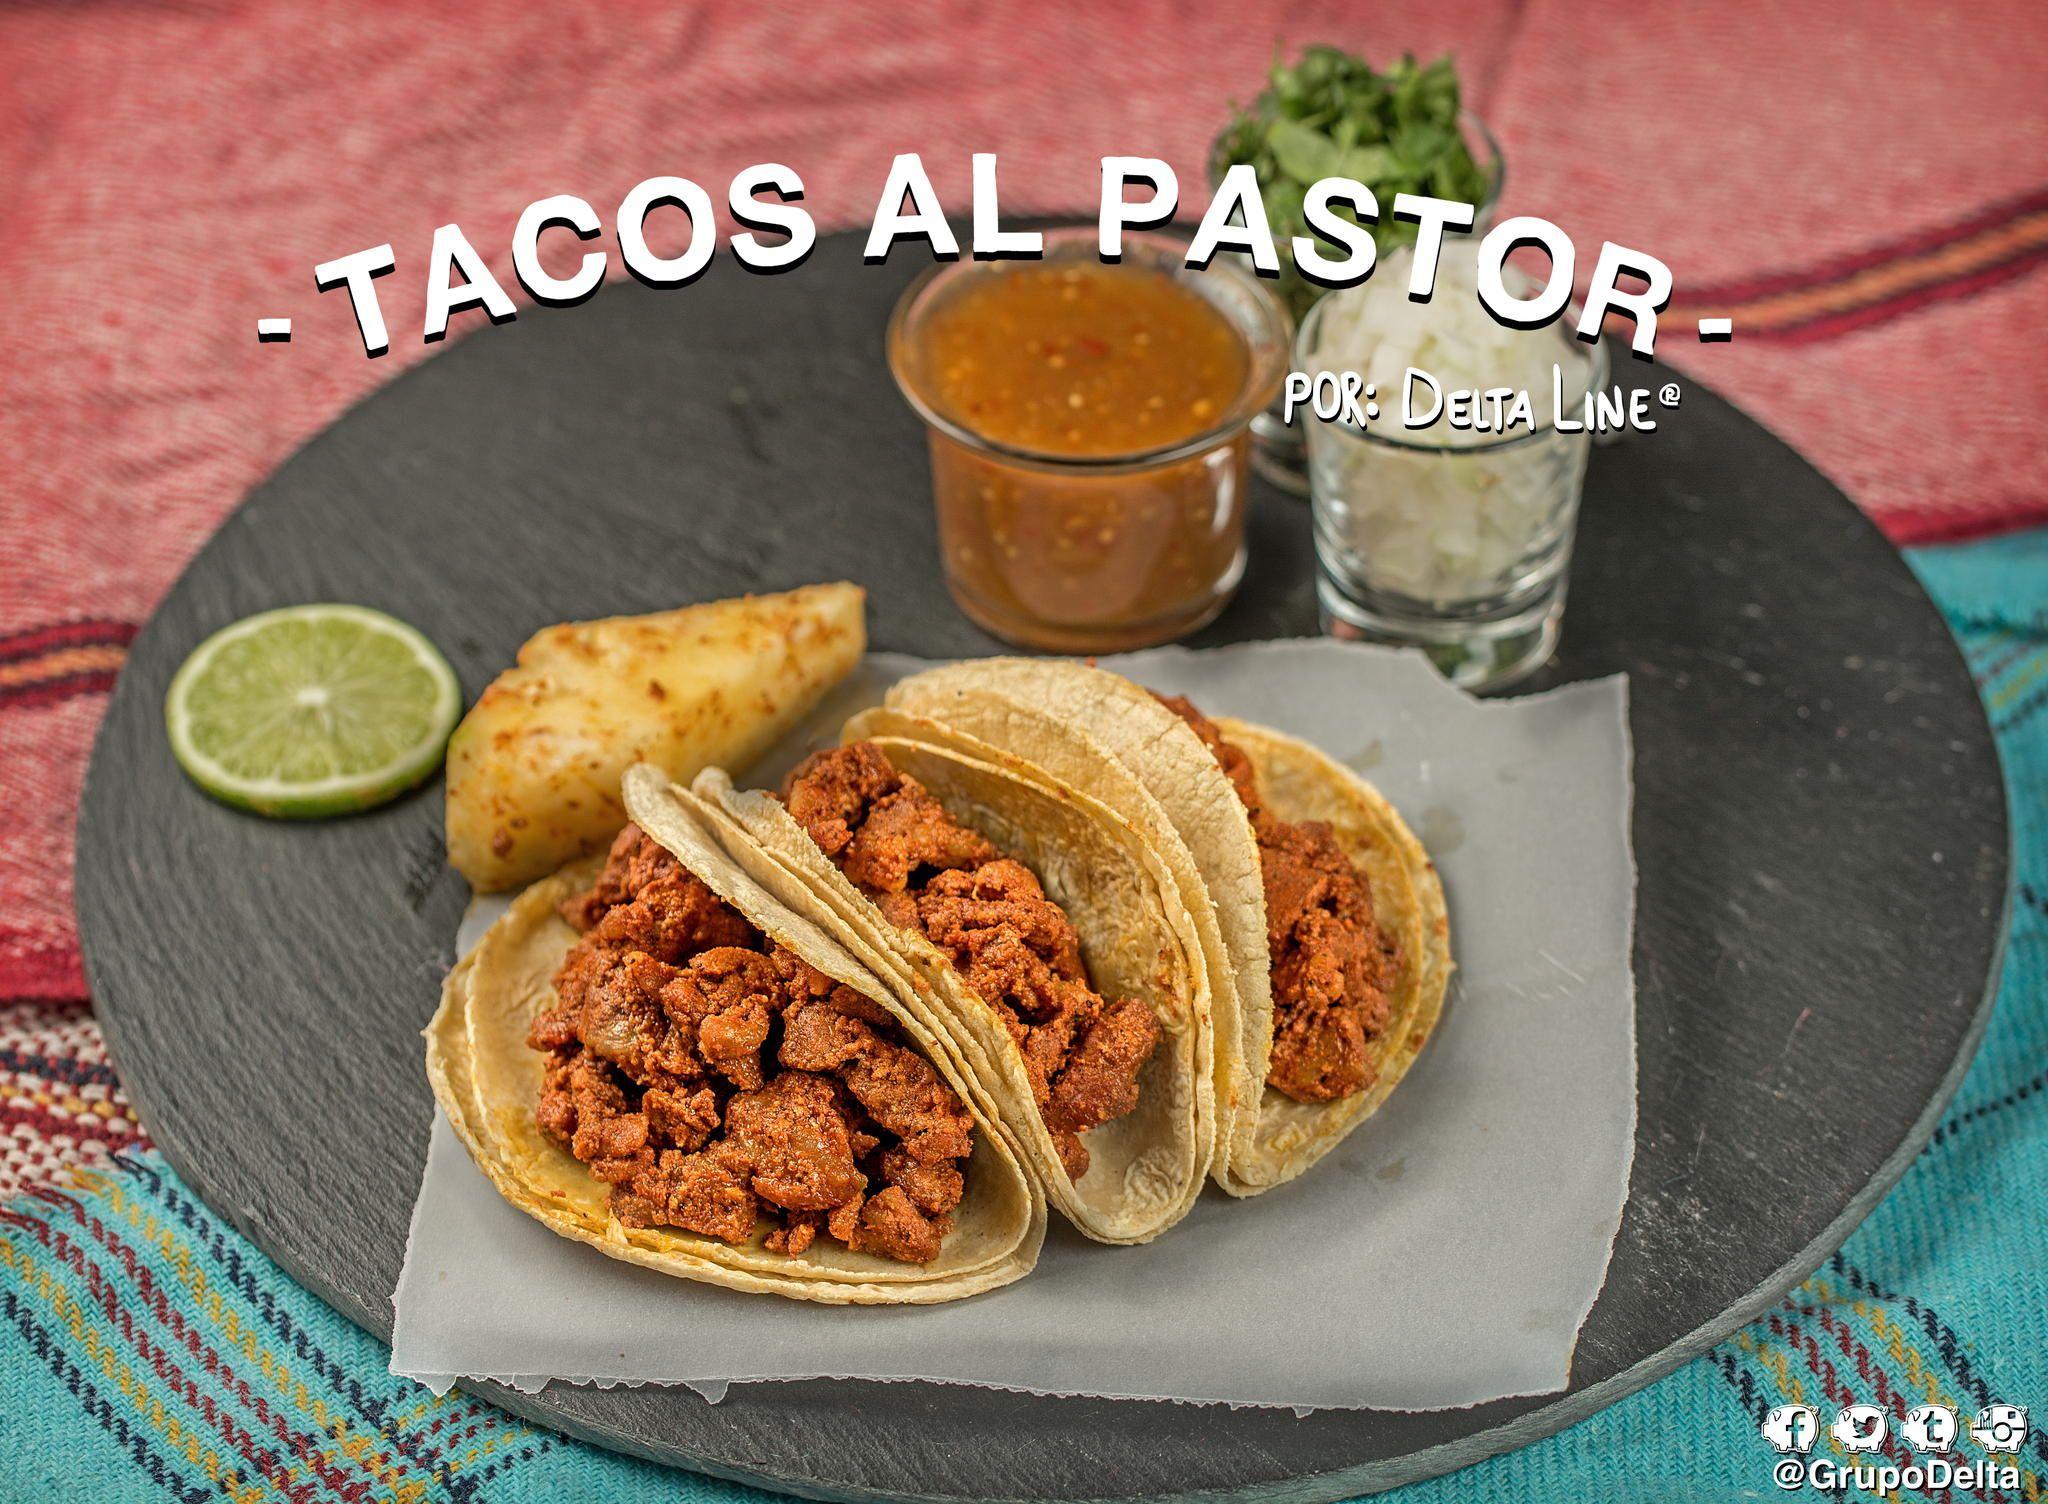 Tacos al Pastor by Diego Chen Brimac on 500px